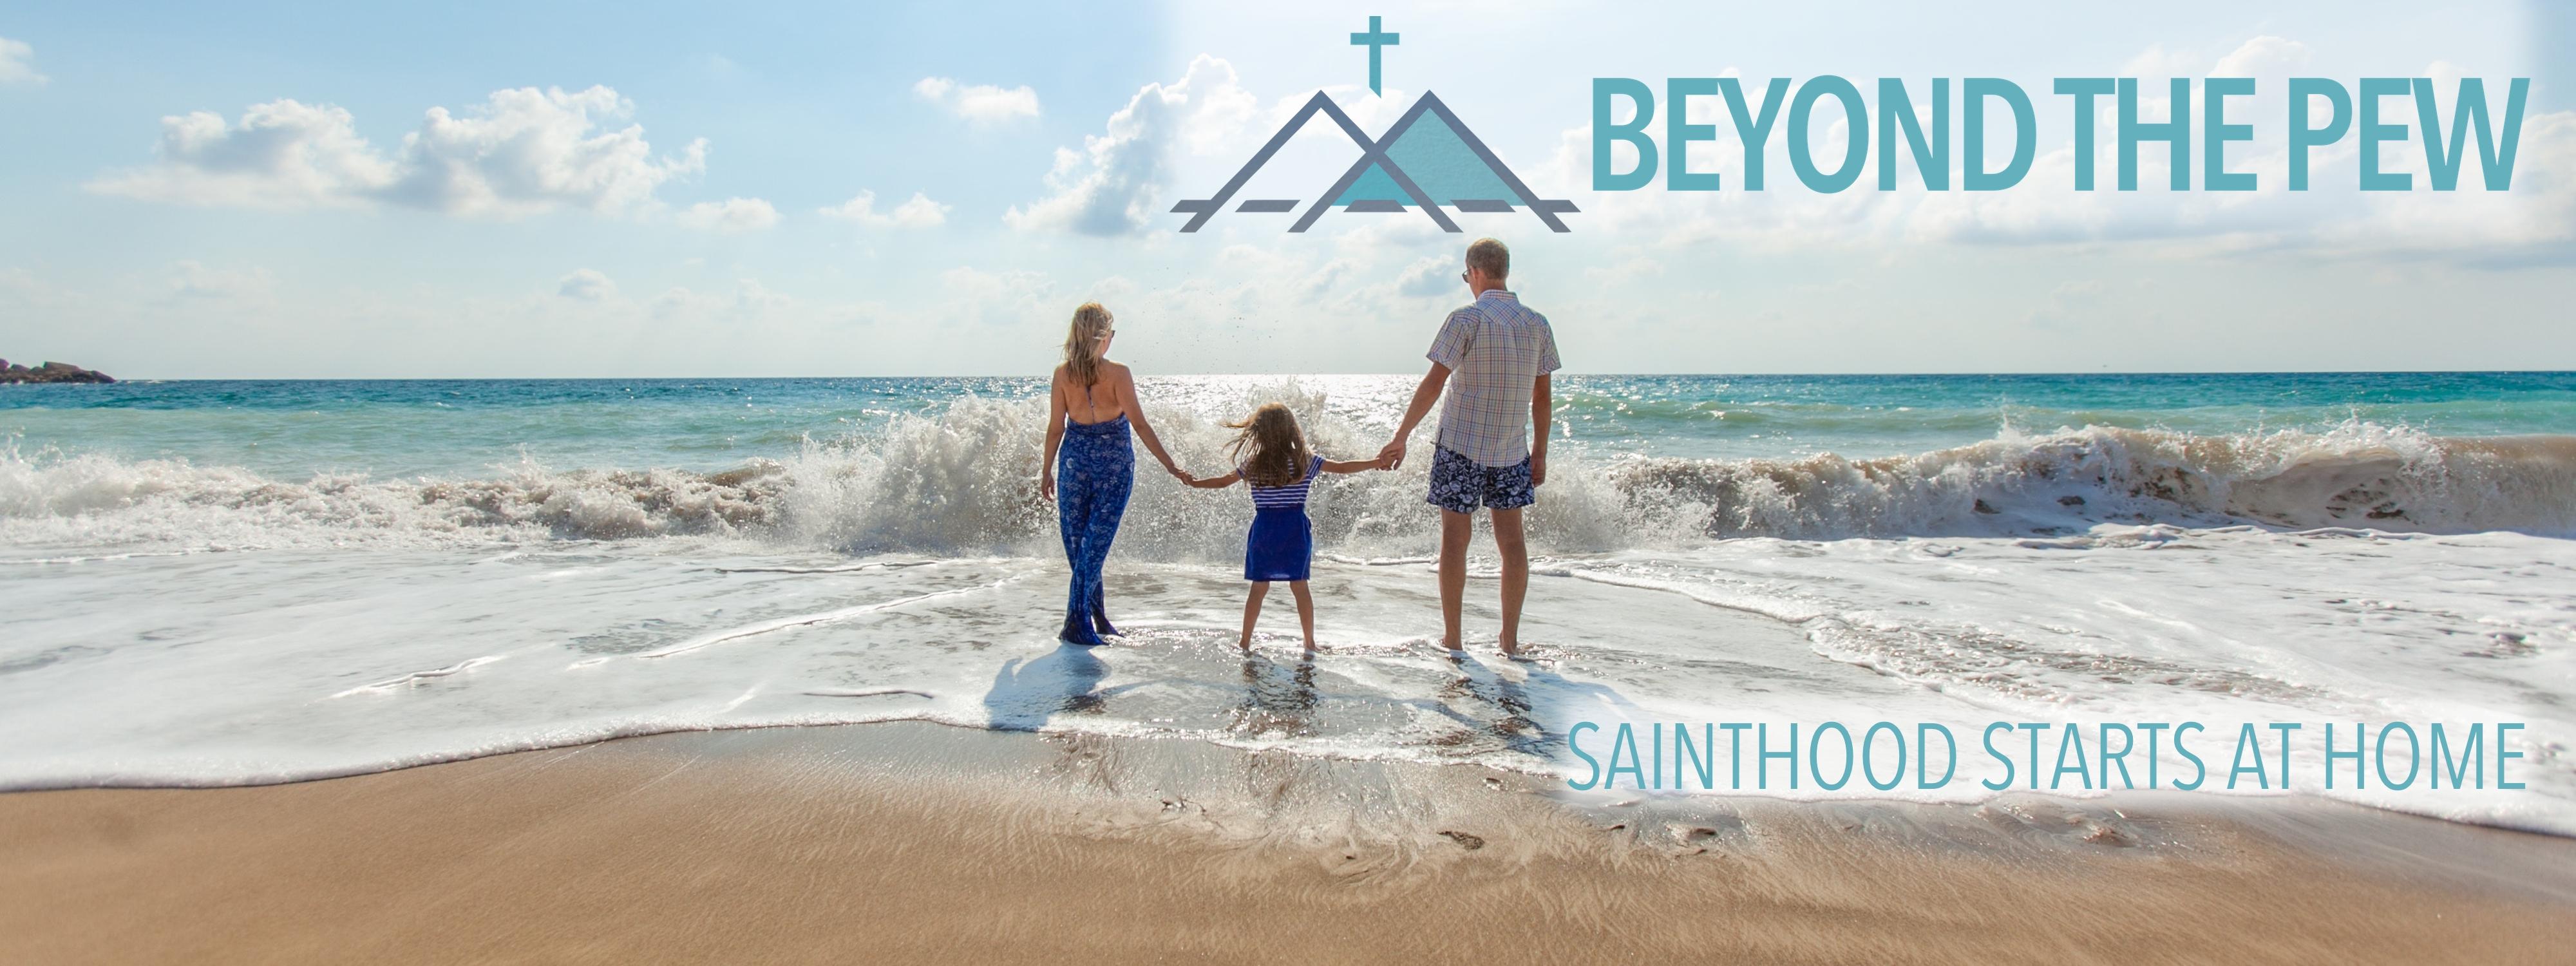 beyond the pew, catholic parenting, sainthood starts at home